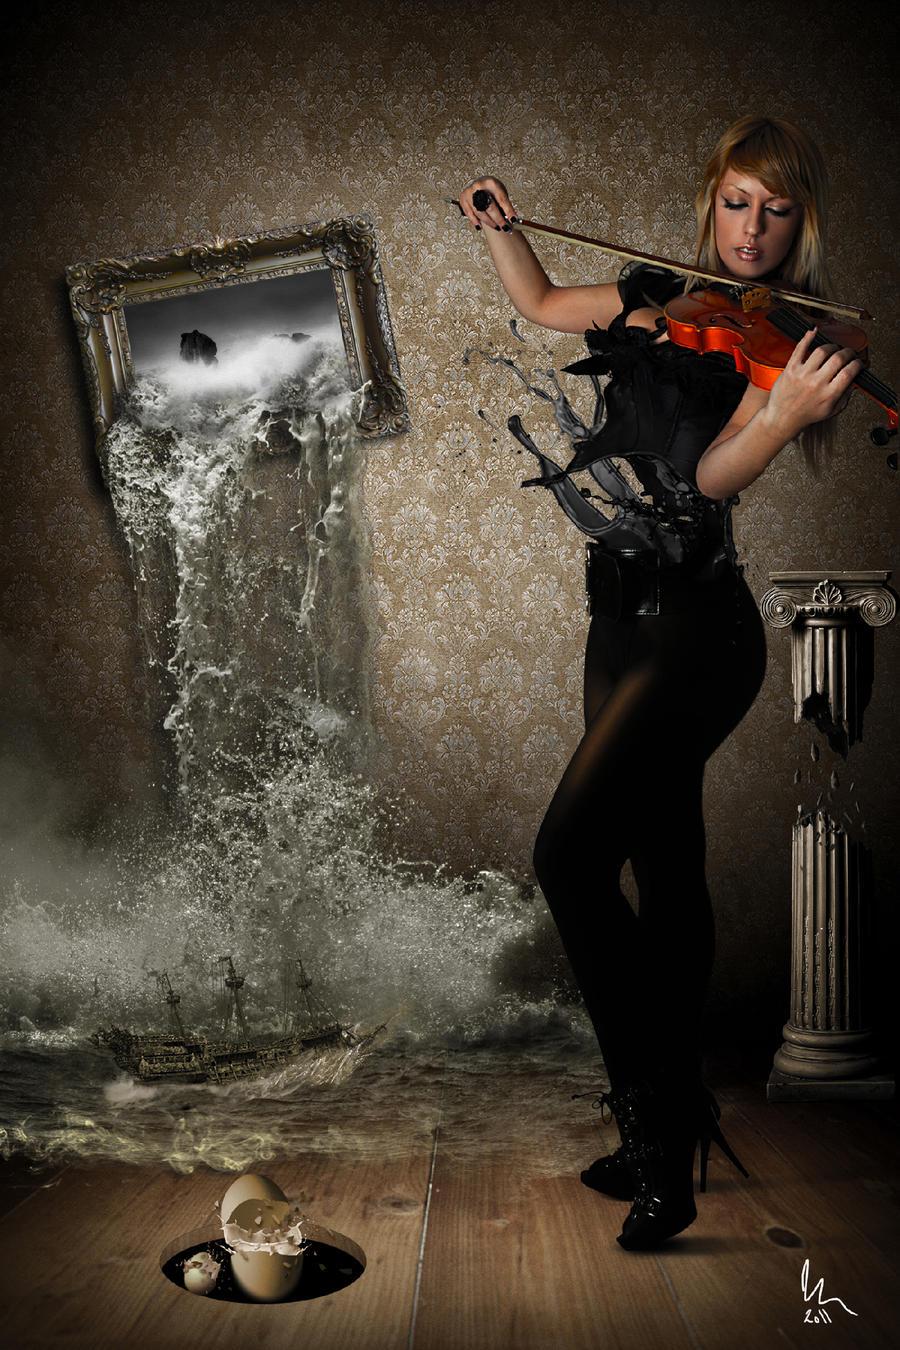 Black hole and Flying Dutchman by Replik4art